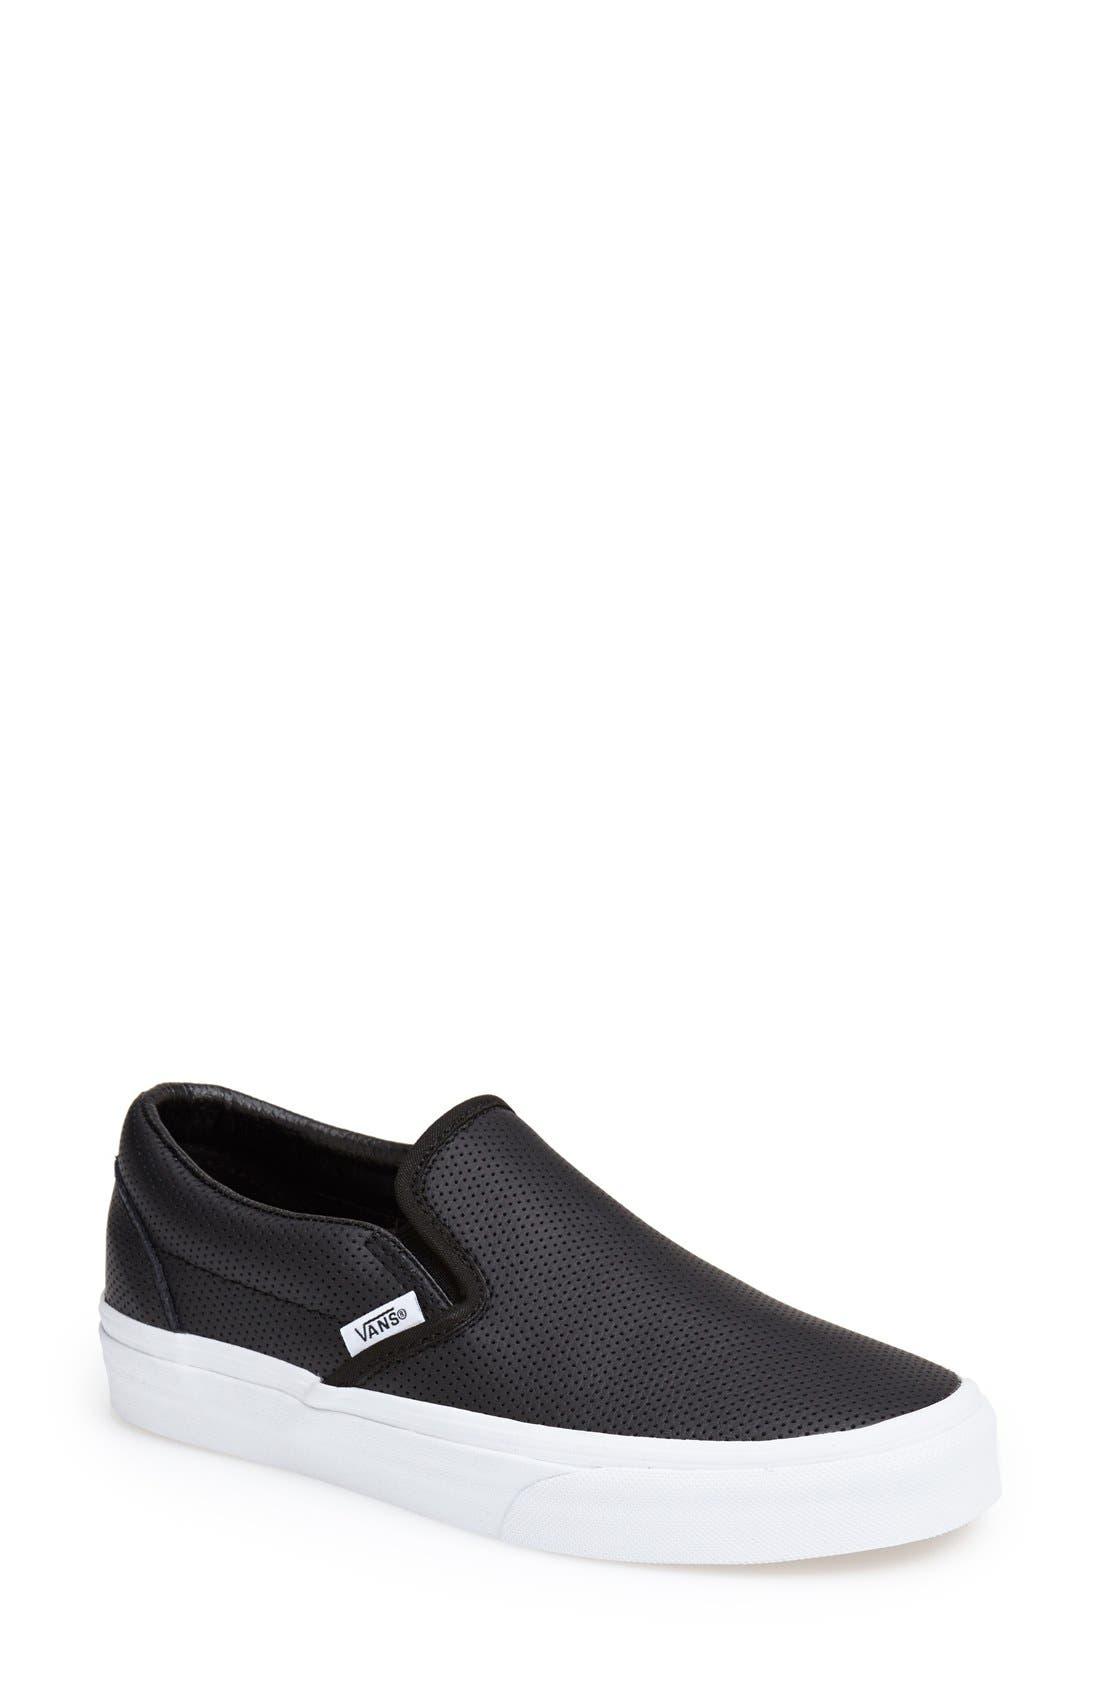 Vans \u0027Classic\u0027 Sneaker ...